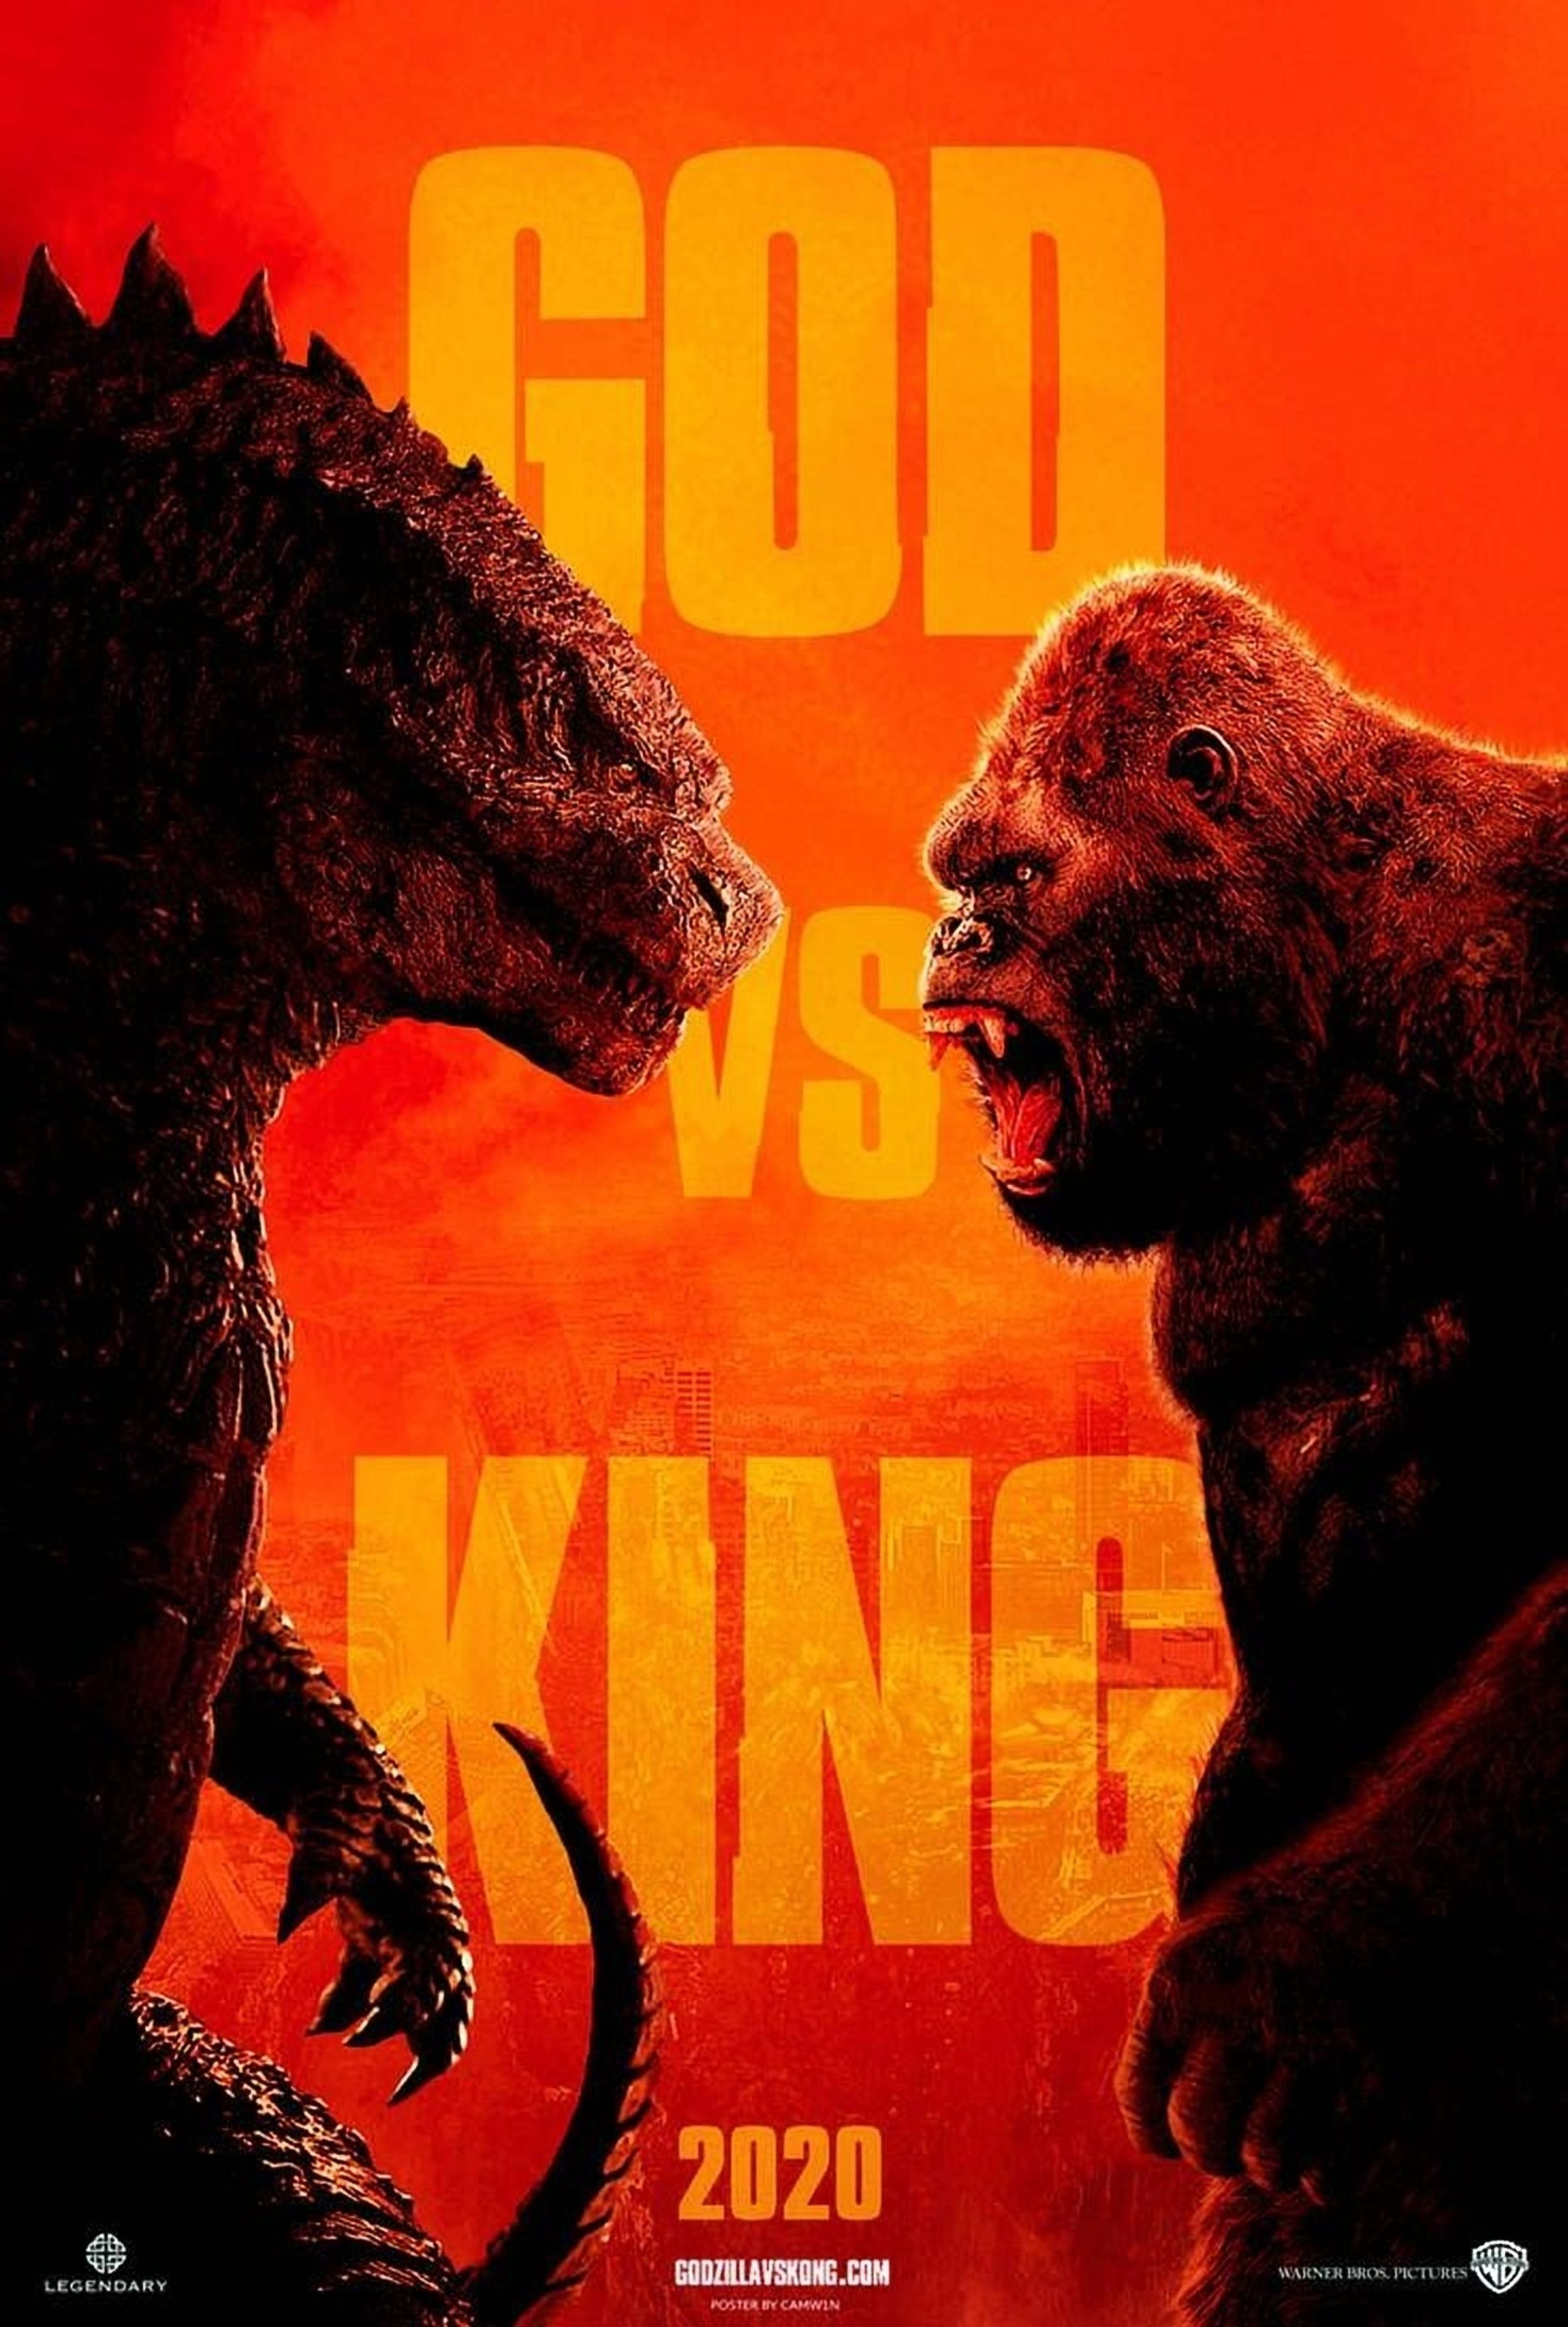 Godzilla Vs Kong 2020 3370 5000 King Kong Vs Godzilla Godzilla Filmes Completos E Dublados